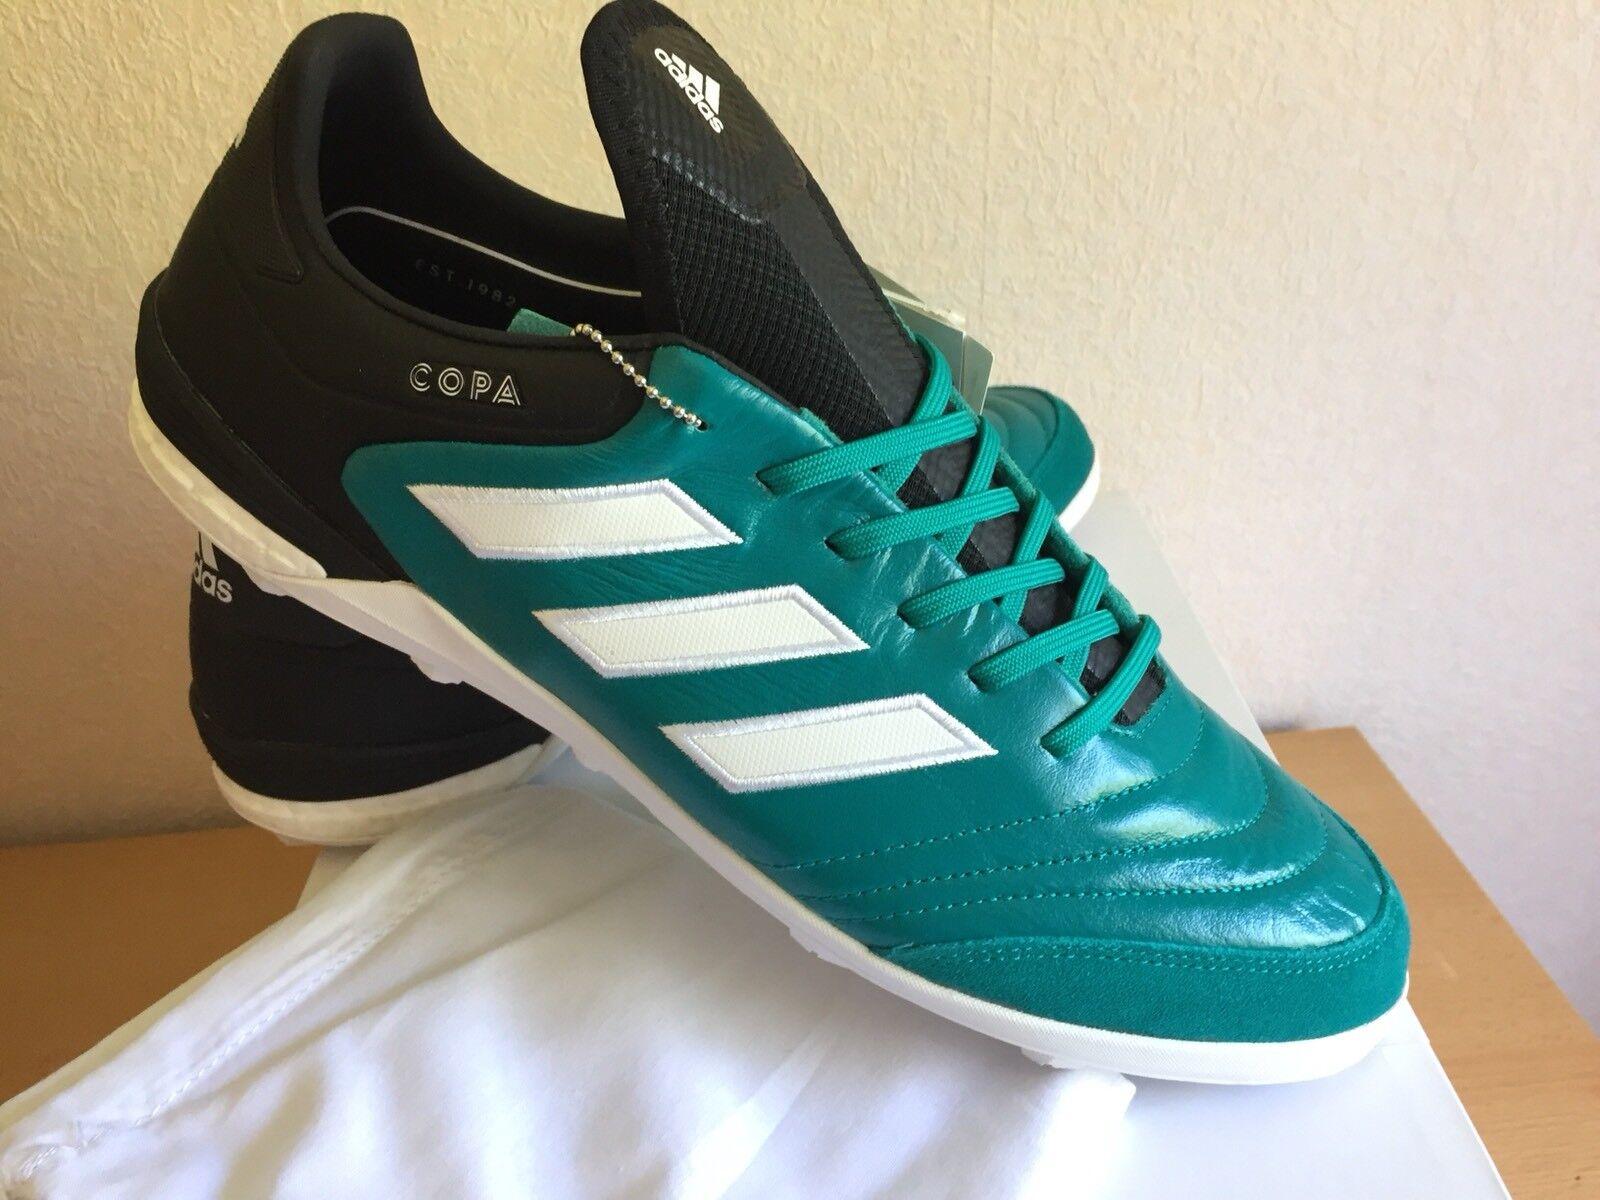 Adidas Copa Tango 17.1 TF EQT vert EquipHommest 45 1 3 10,5 11 nouveau Prougeator Mania